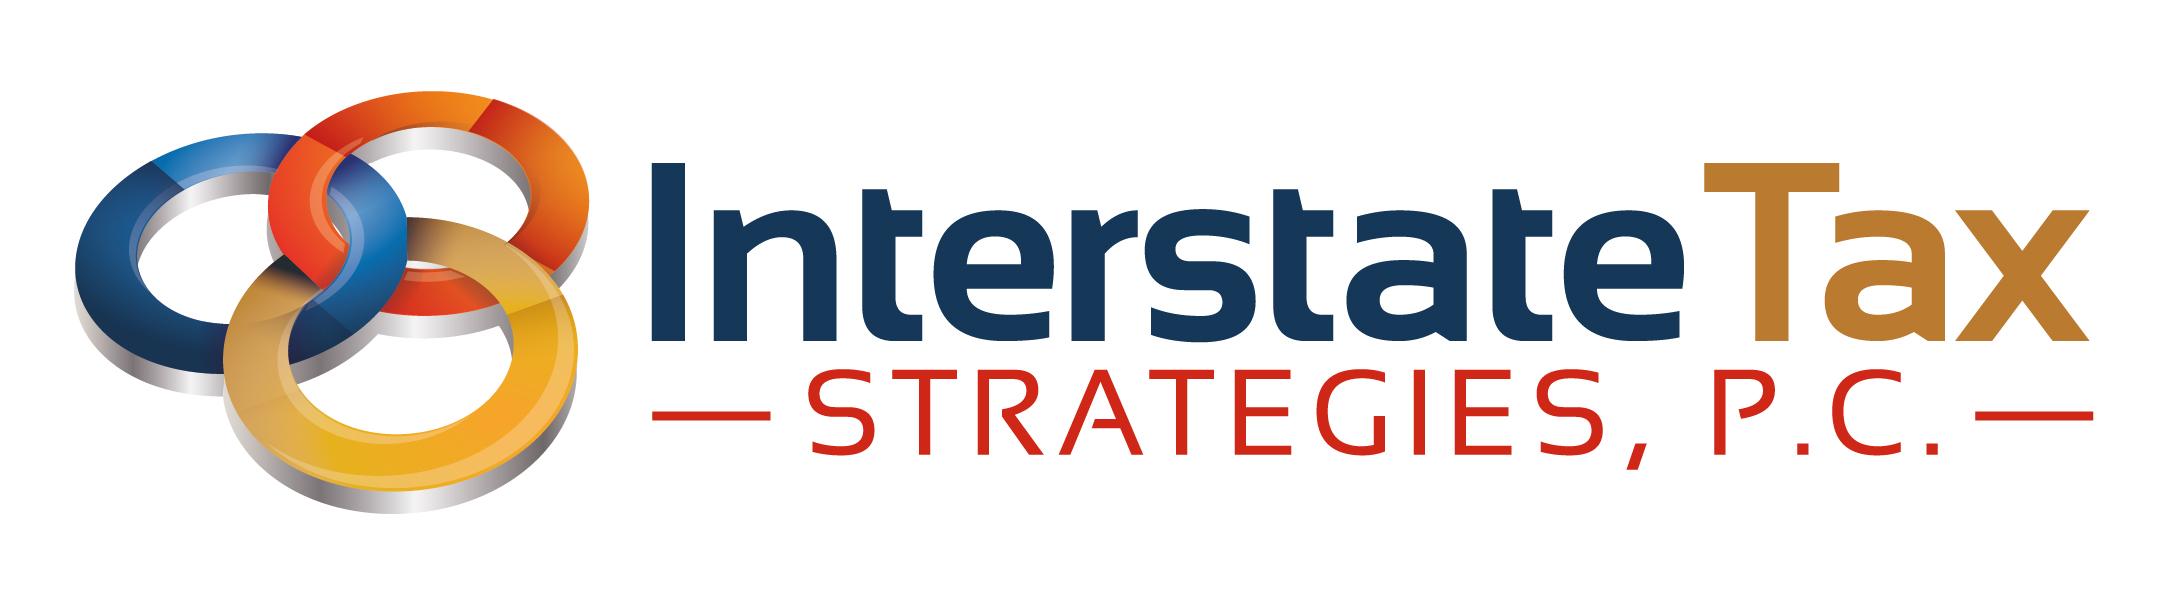 Voluntary Disclosure Services Interstate Tax Strategies Pc Atlanta